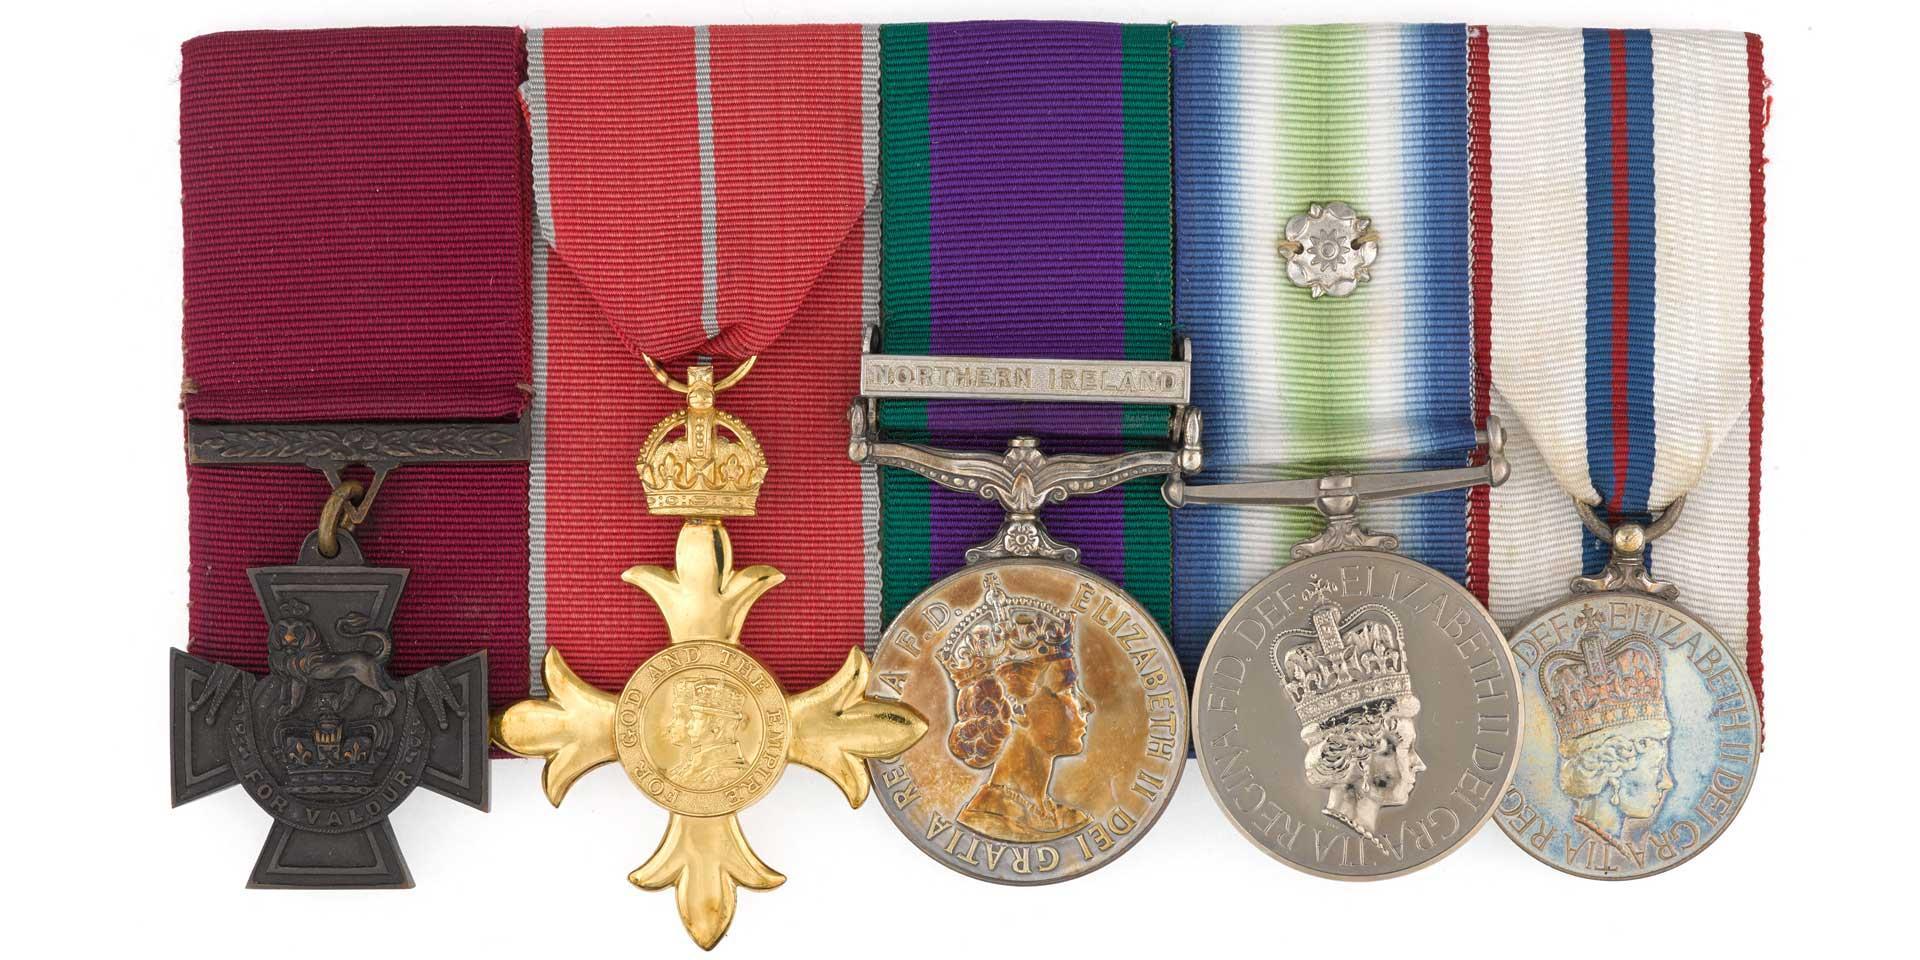 Victoria Cross group awarded to Lieutenant-Colonel Herbert 'H' Jones, 2nd Battalion The Parachute Regiment, 1982